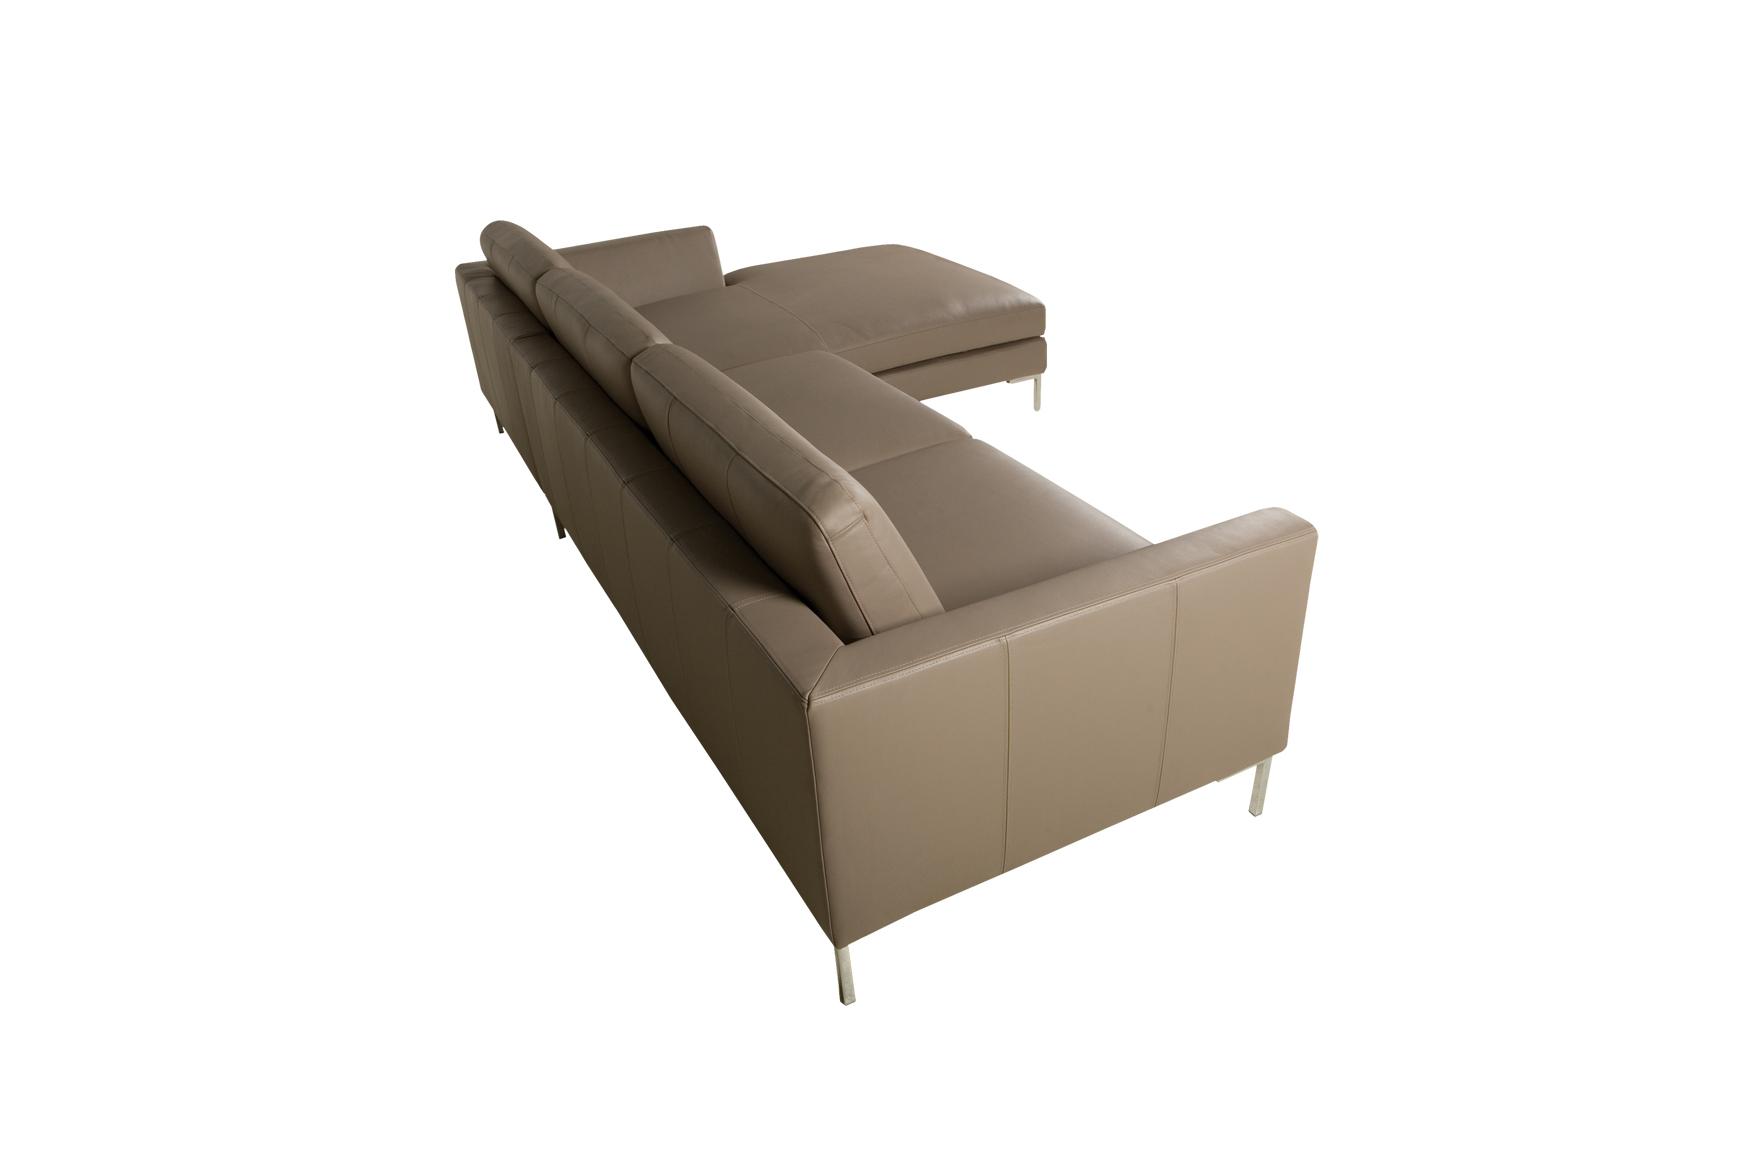 Allegra Set 1 Sofa With Chaiselongue-33207